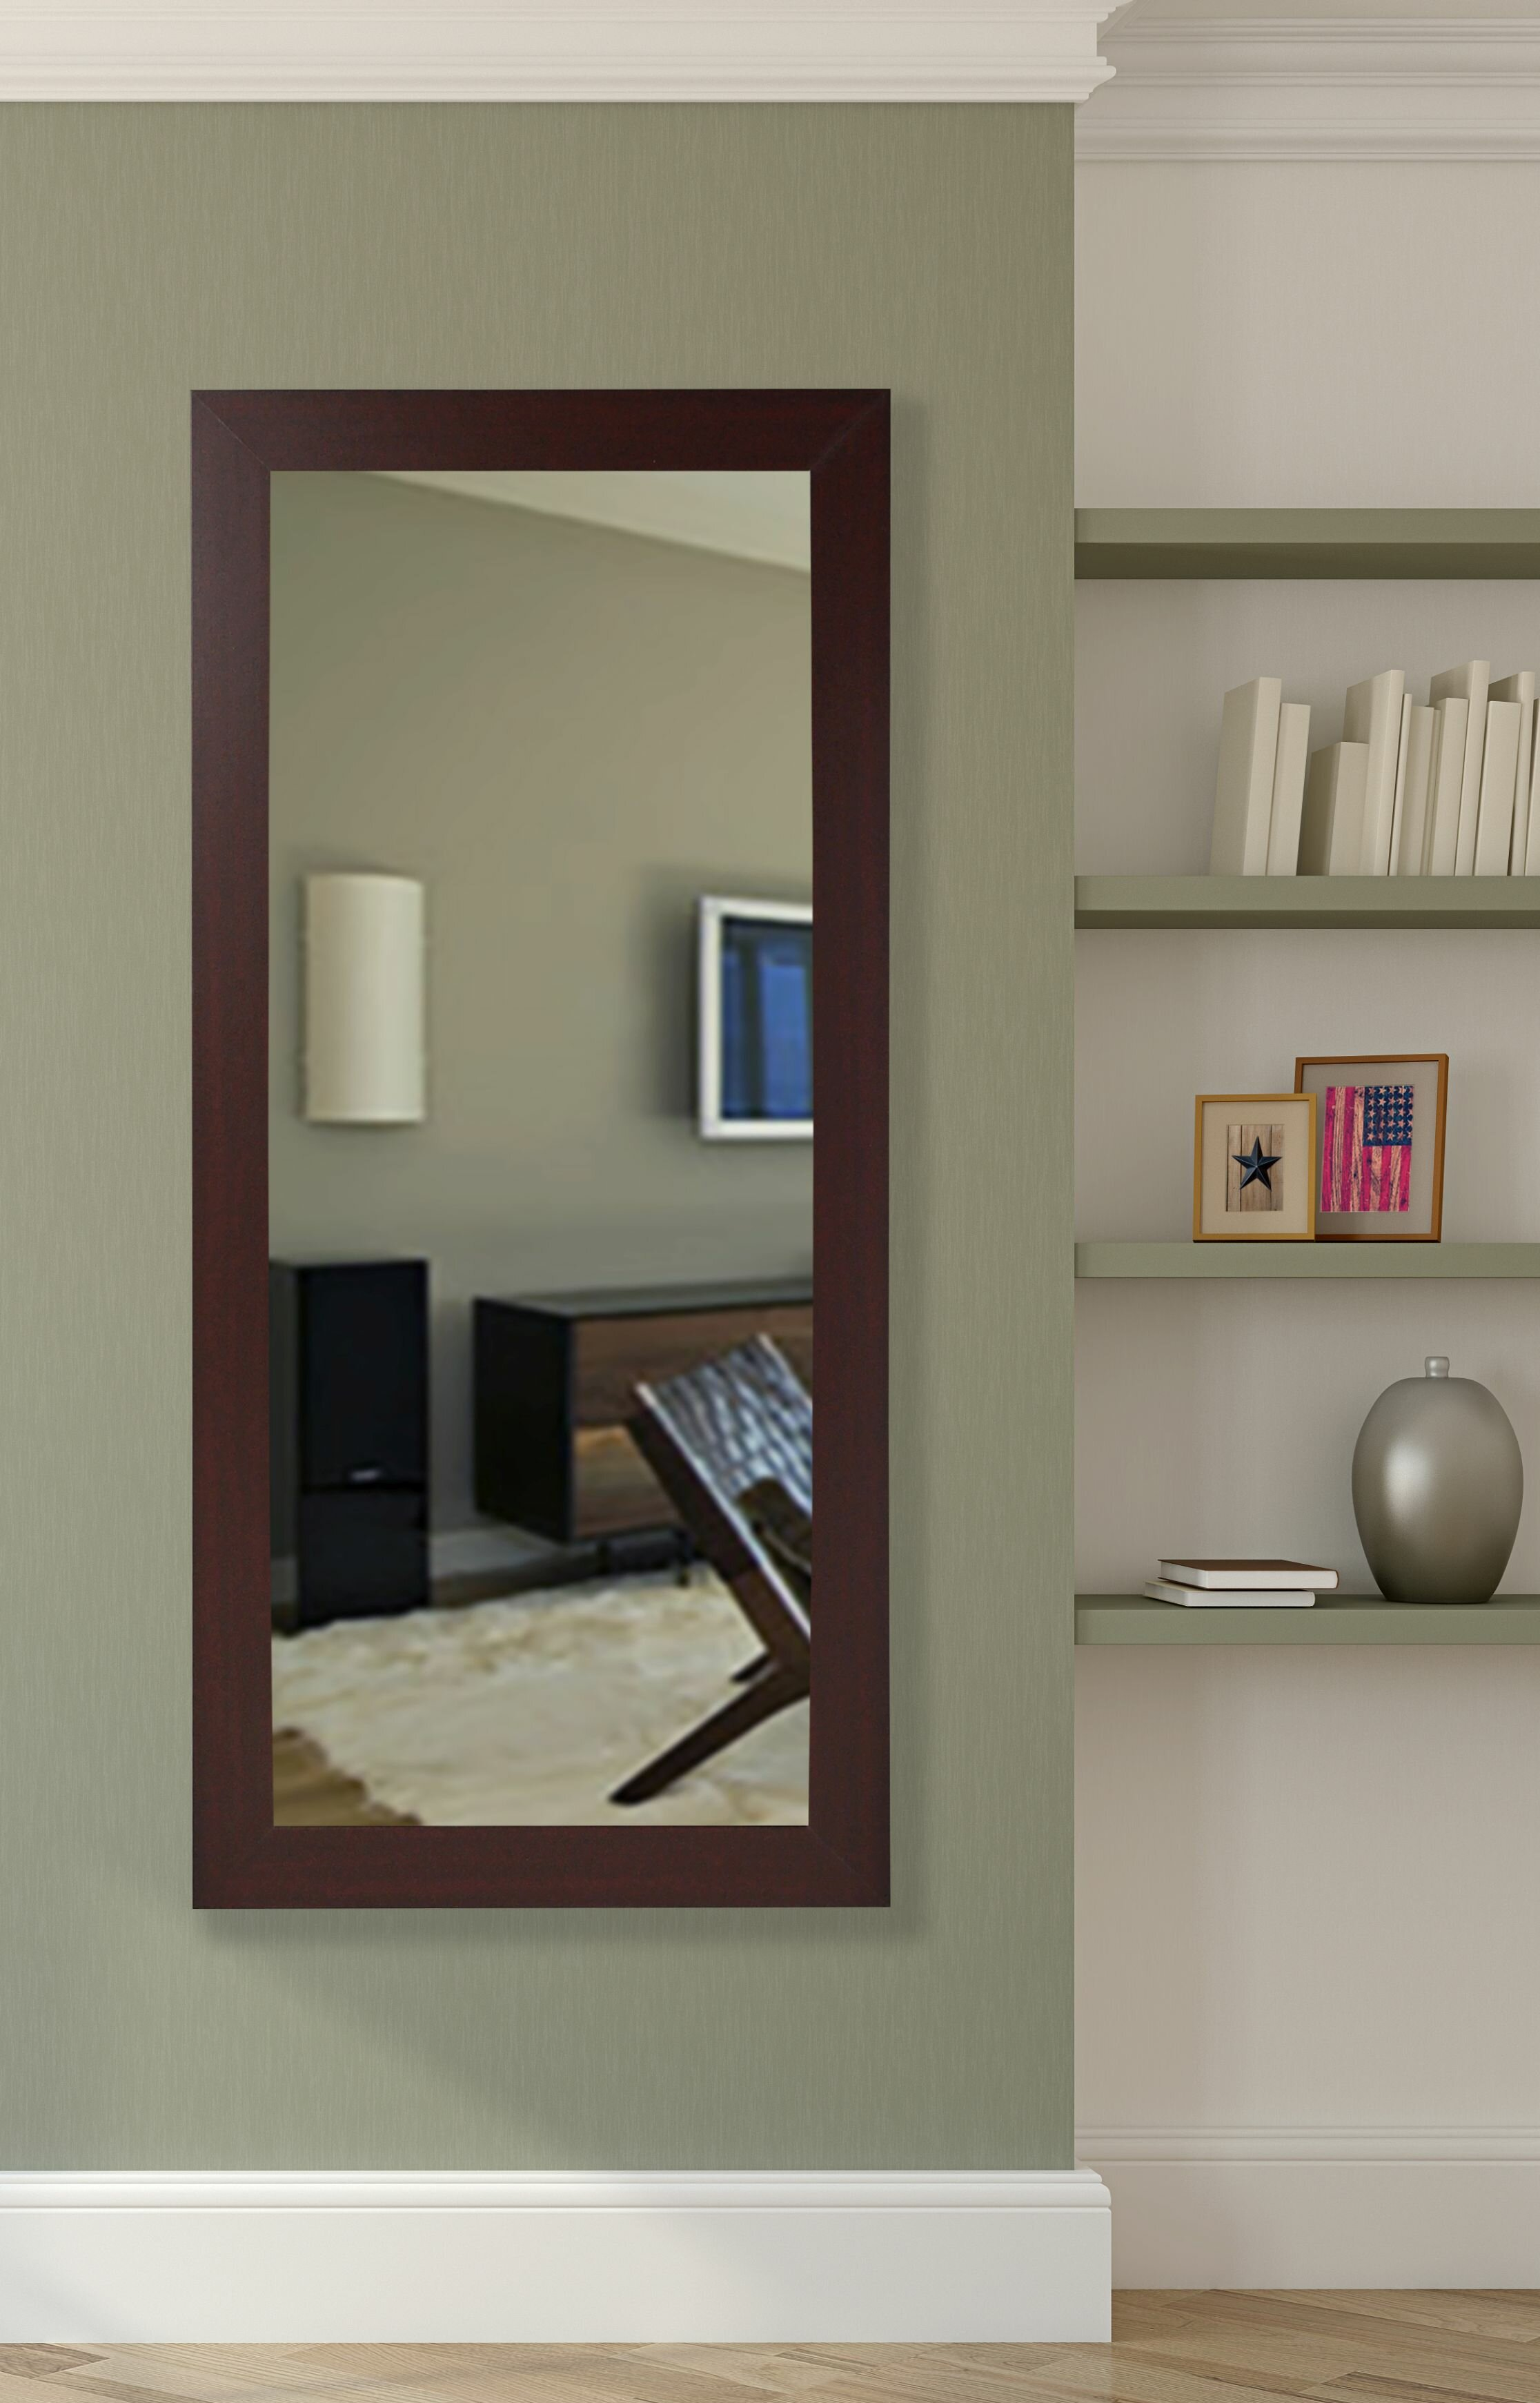 Mahogany Floor Mirror - Flooring Ideas and Inspiration